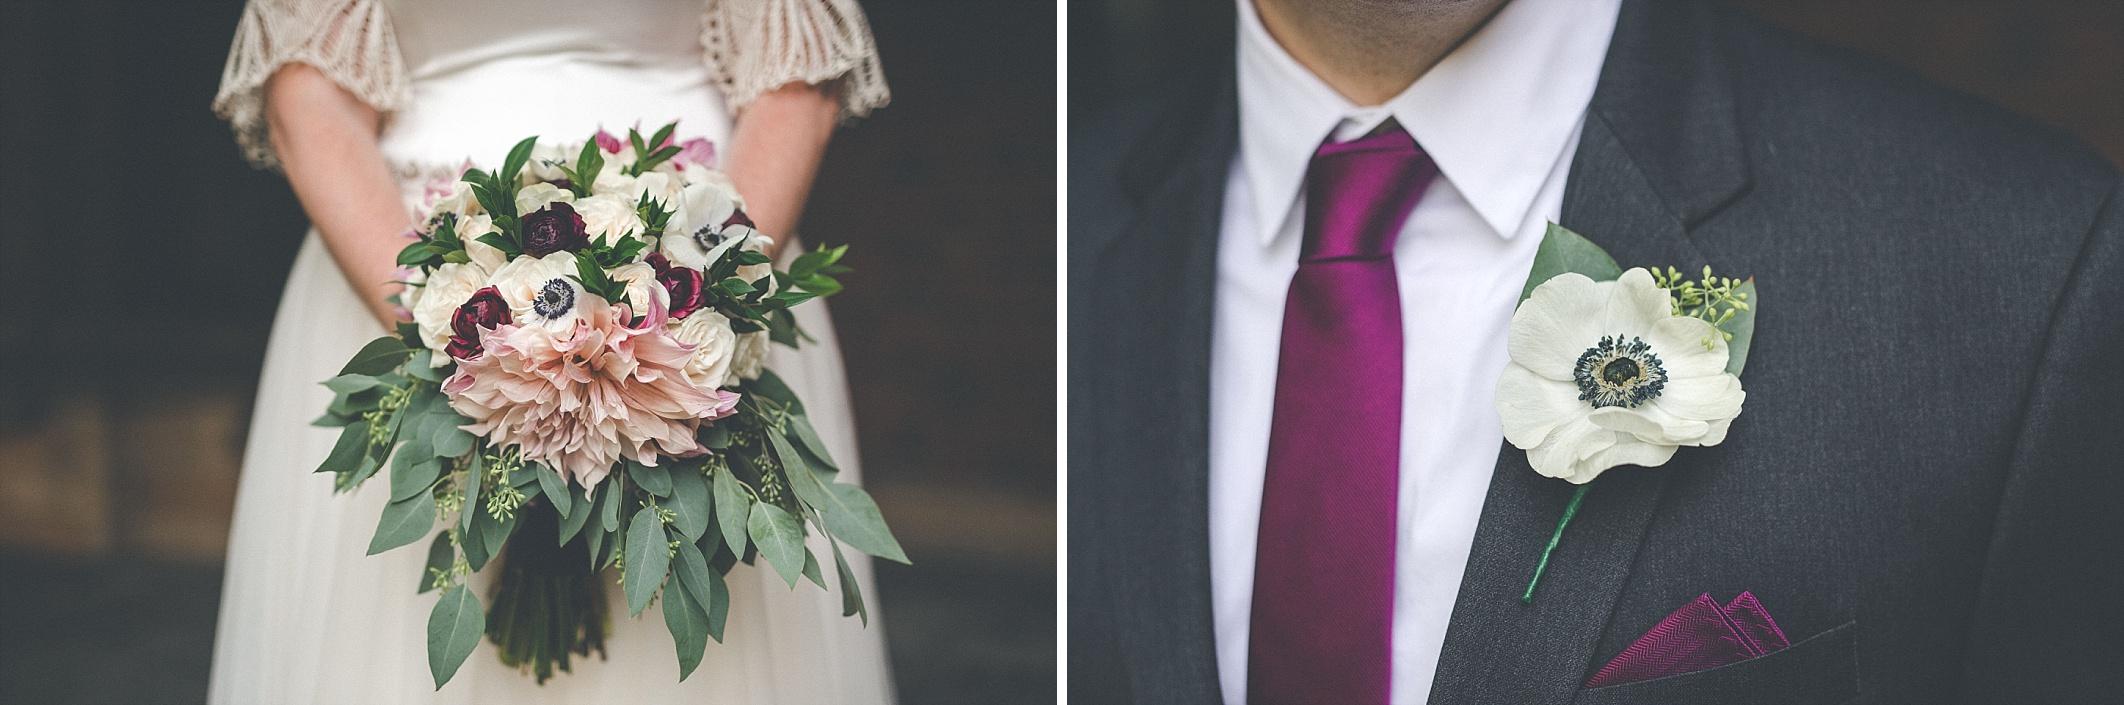 wedding-photographer-dayton-ohio_0003.jpg